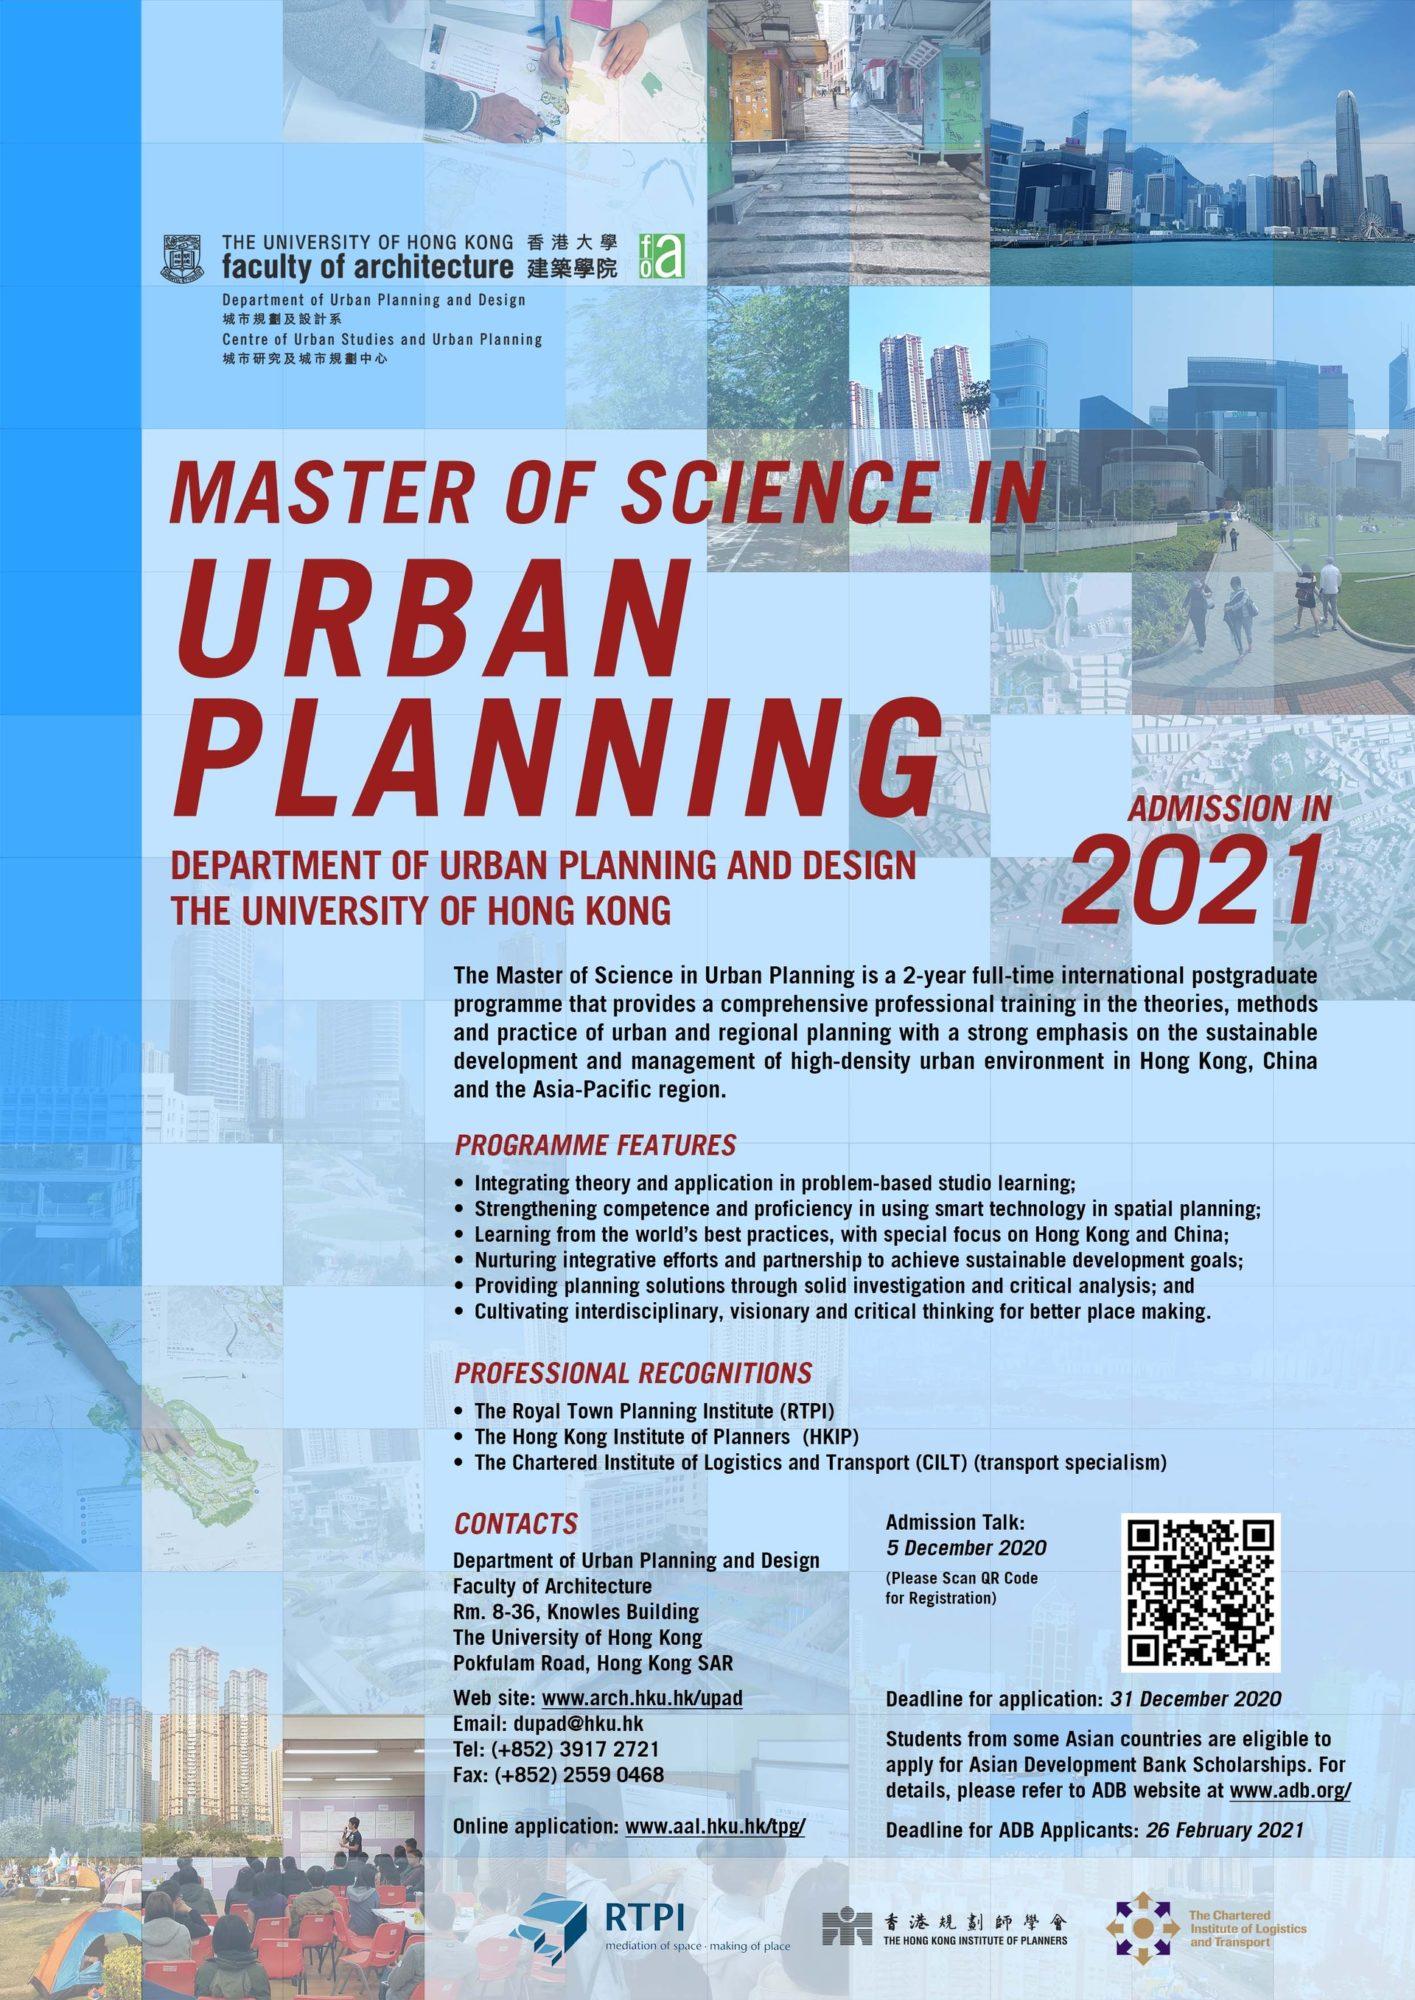 MUP brochure 2020 Poster Image